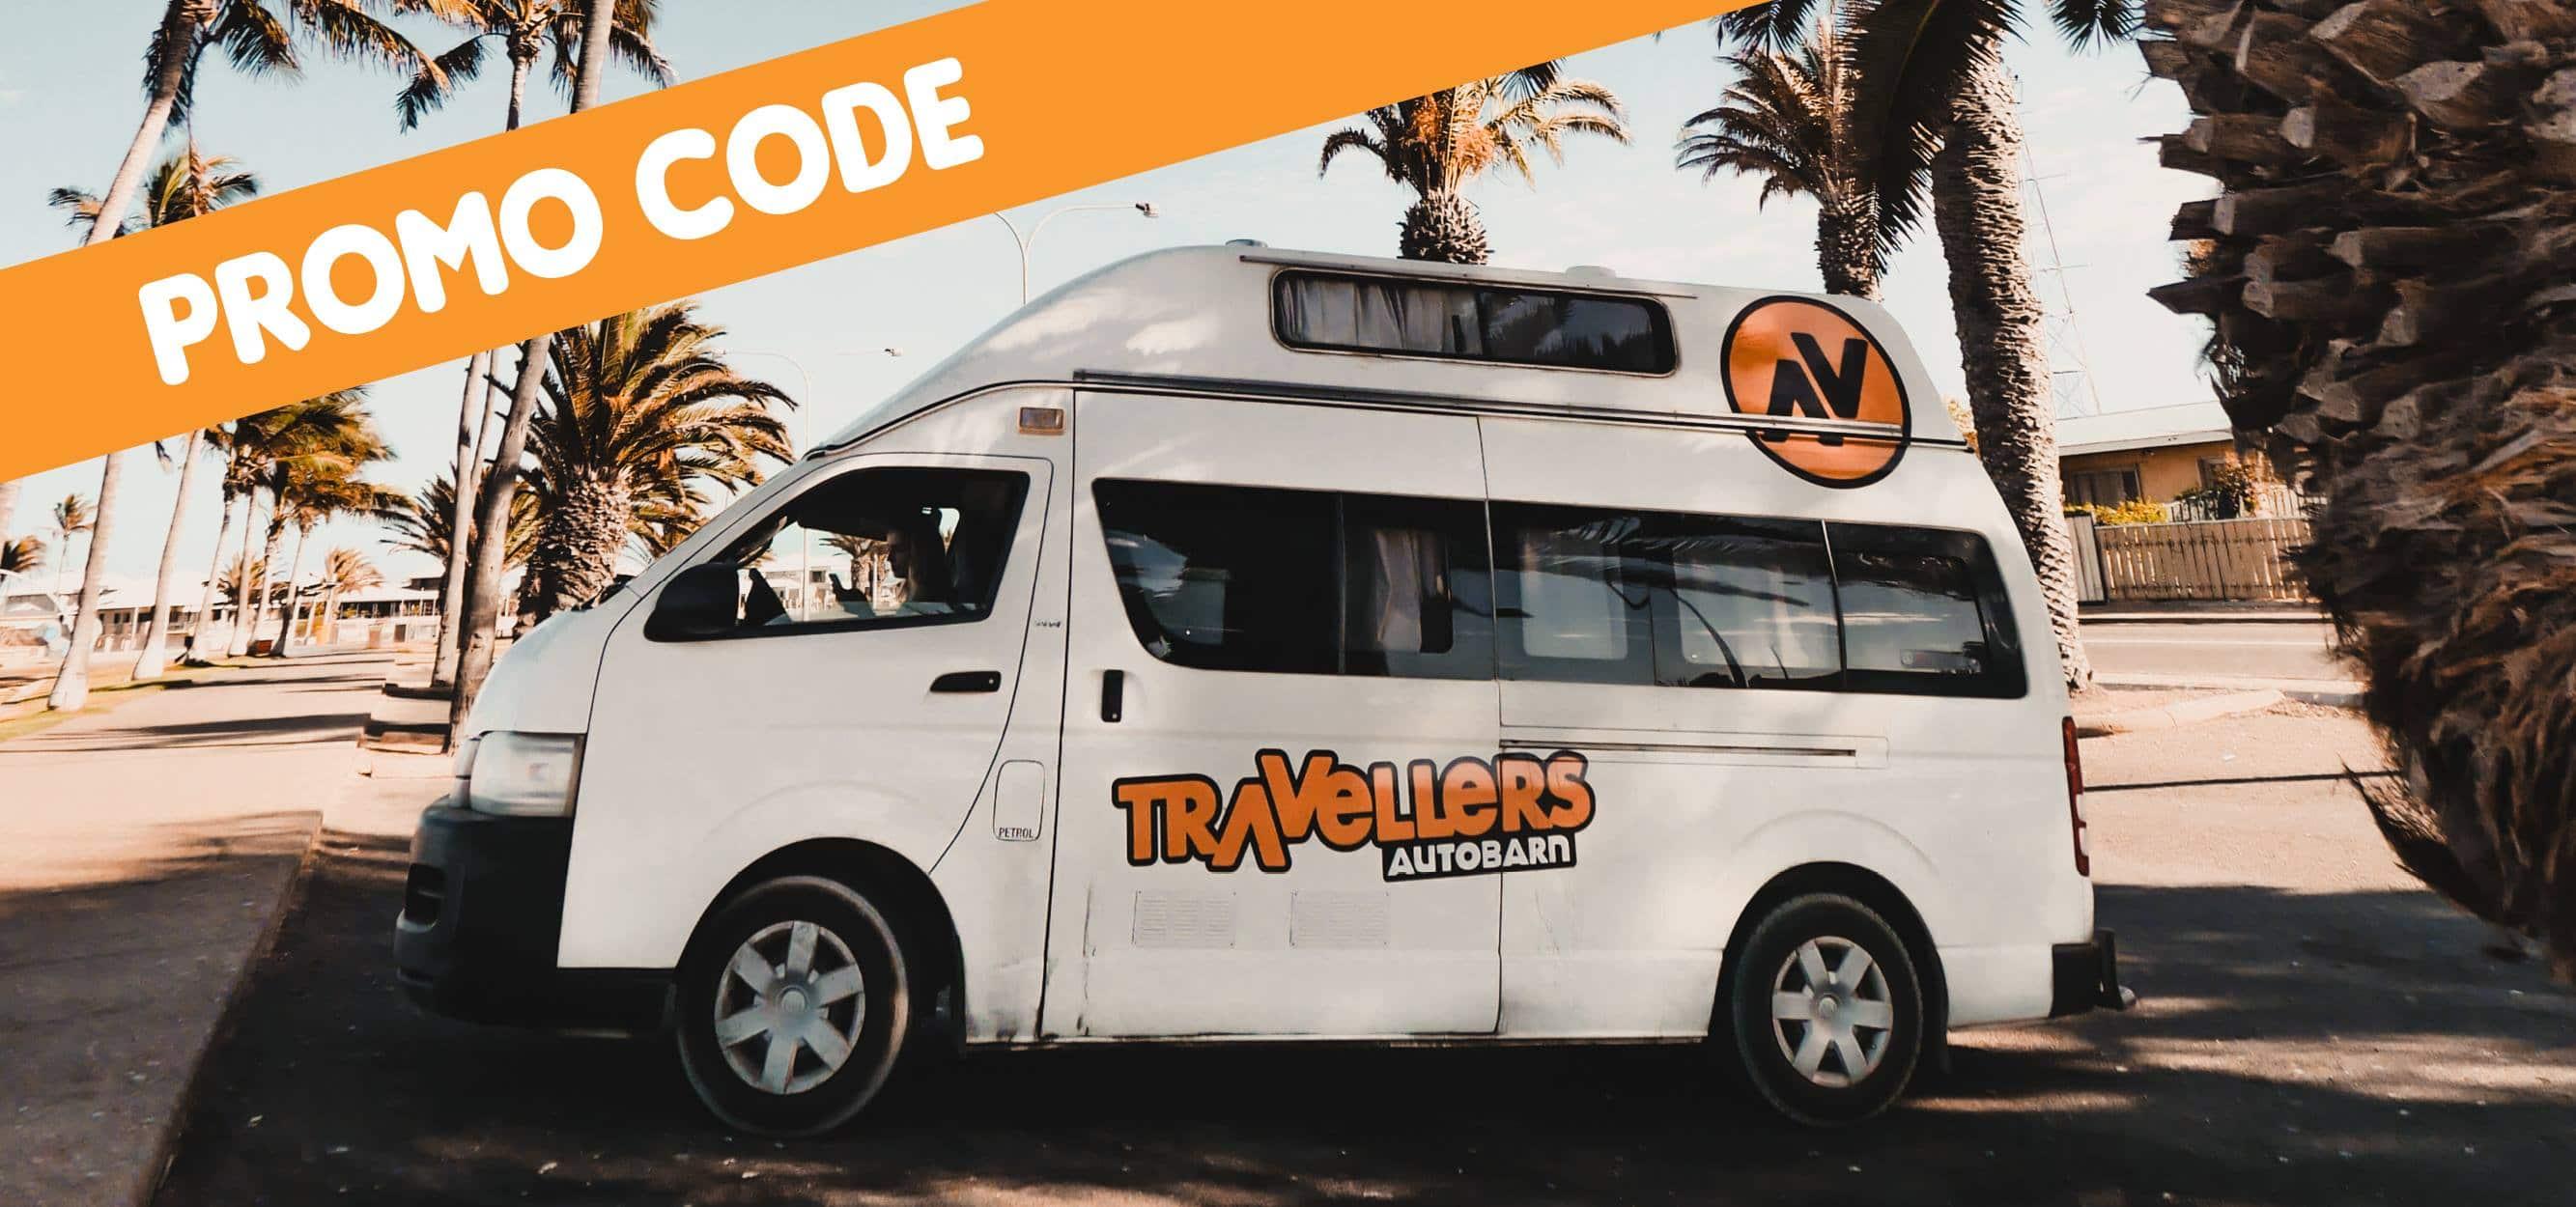 Travellers Autobarn Promo Code Cheap Campervan Rentals